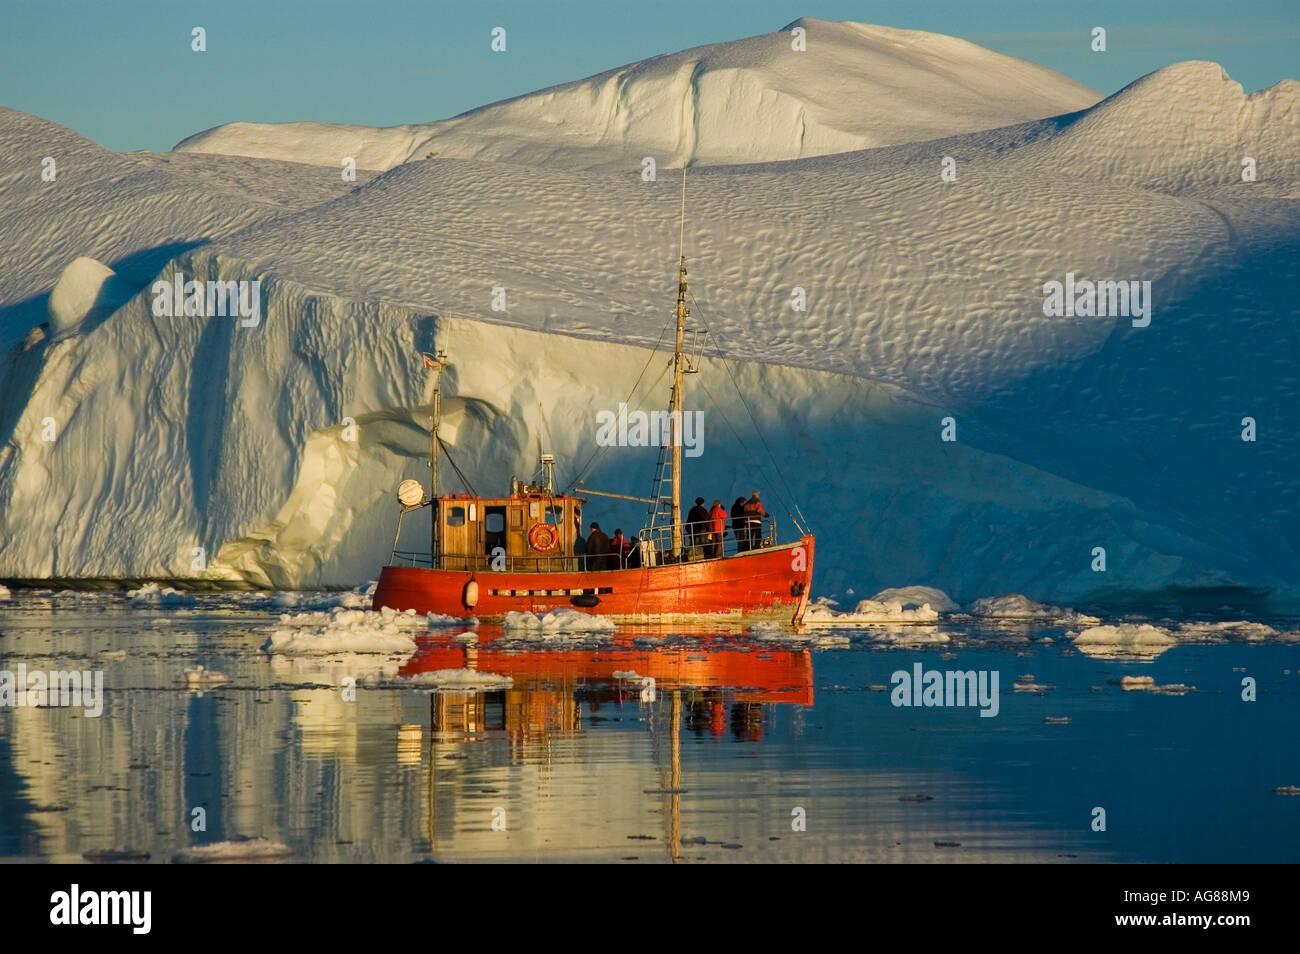 Fishing cutter / fishing smack in Kangia icefjord, Disko Bay, Unesco Nature Heritage, Greenland, Ilulissat, Jakobshavn icefjord - Stock Image